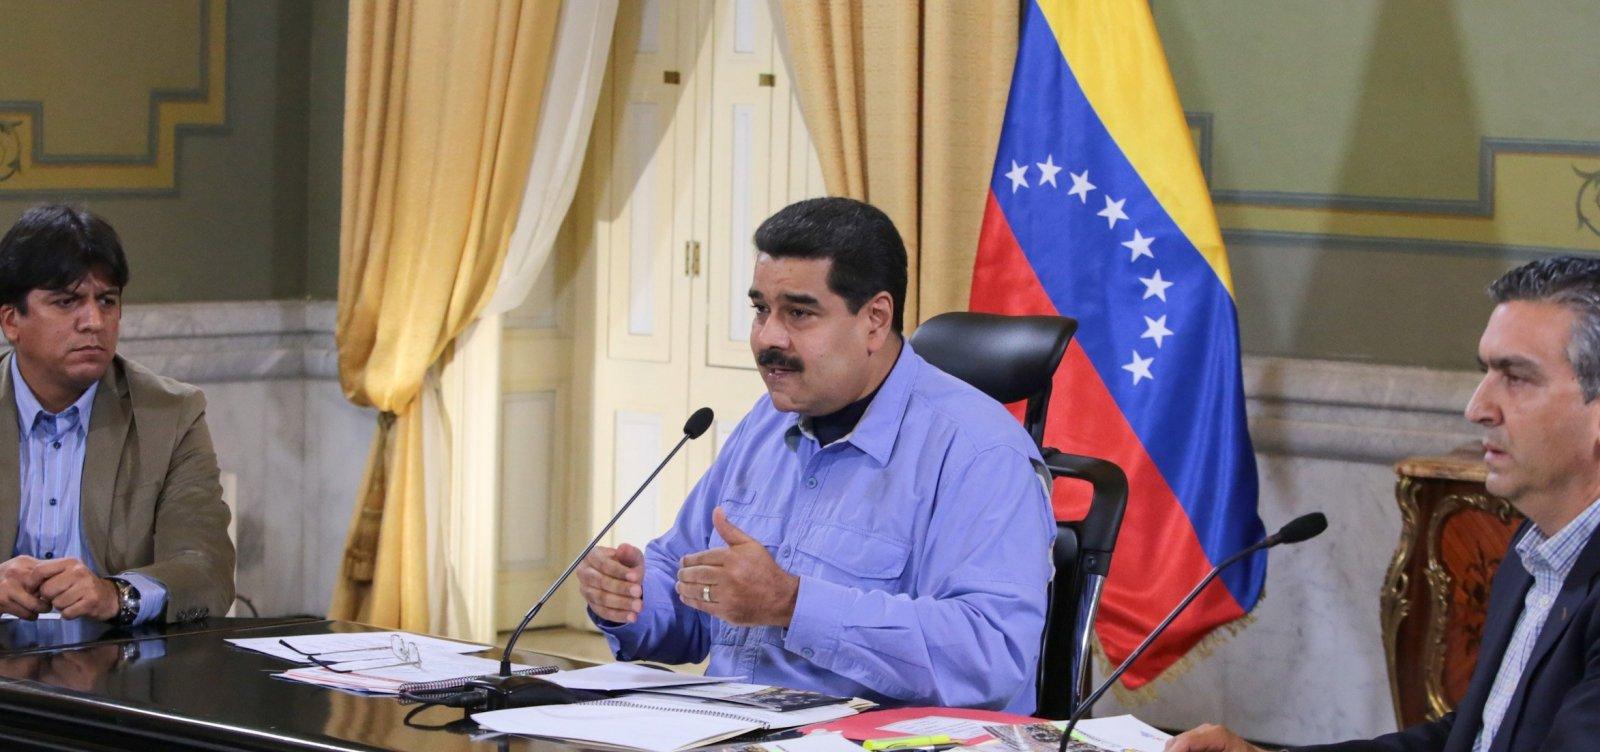 [Presidente da Venezuela promete 'arrebentar os dentes' de Bolsonaro]